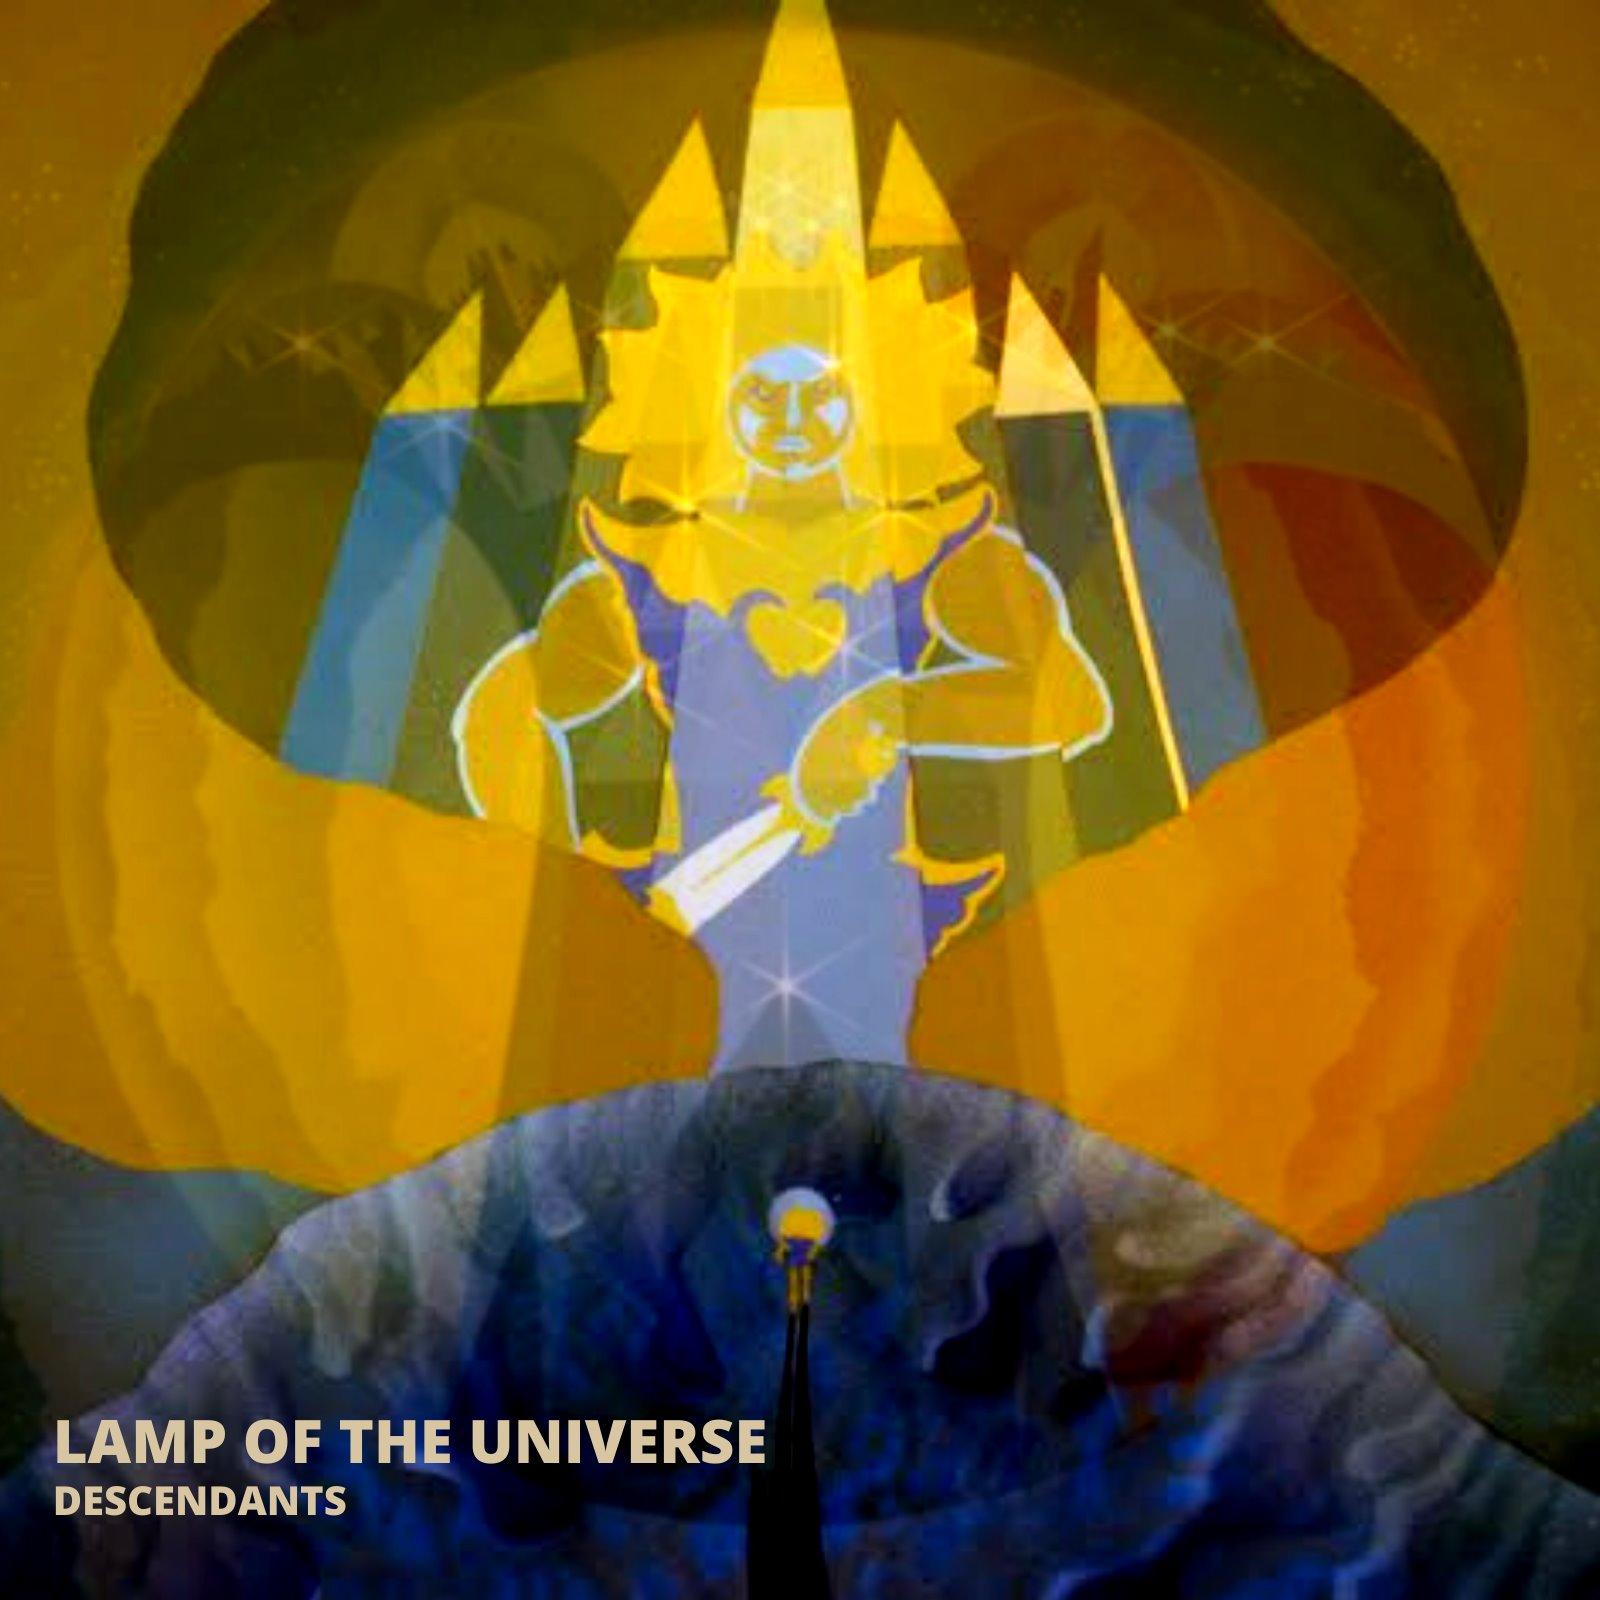 lamp of the universe descendants